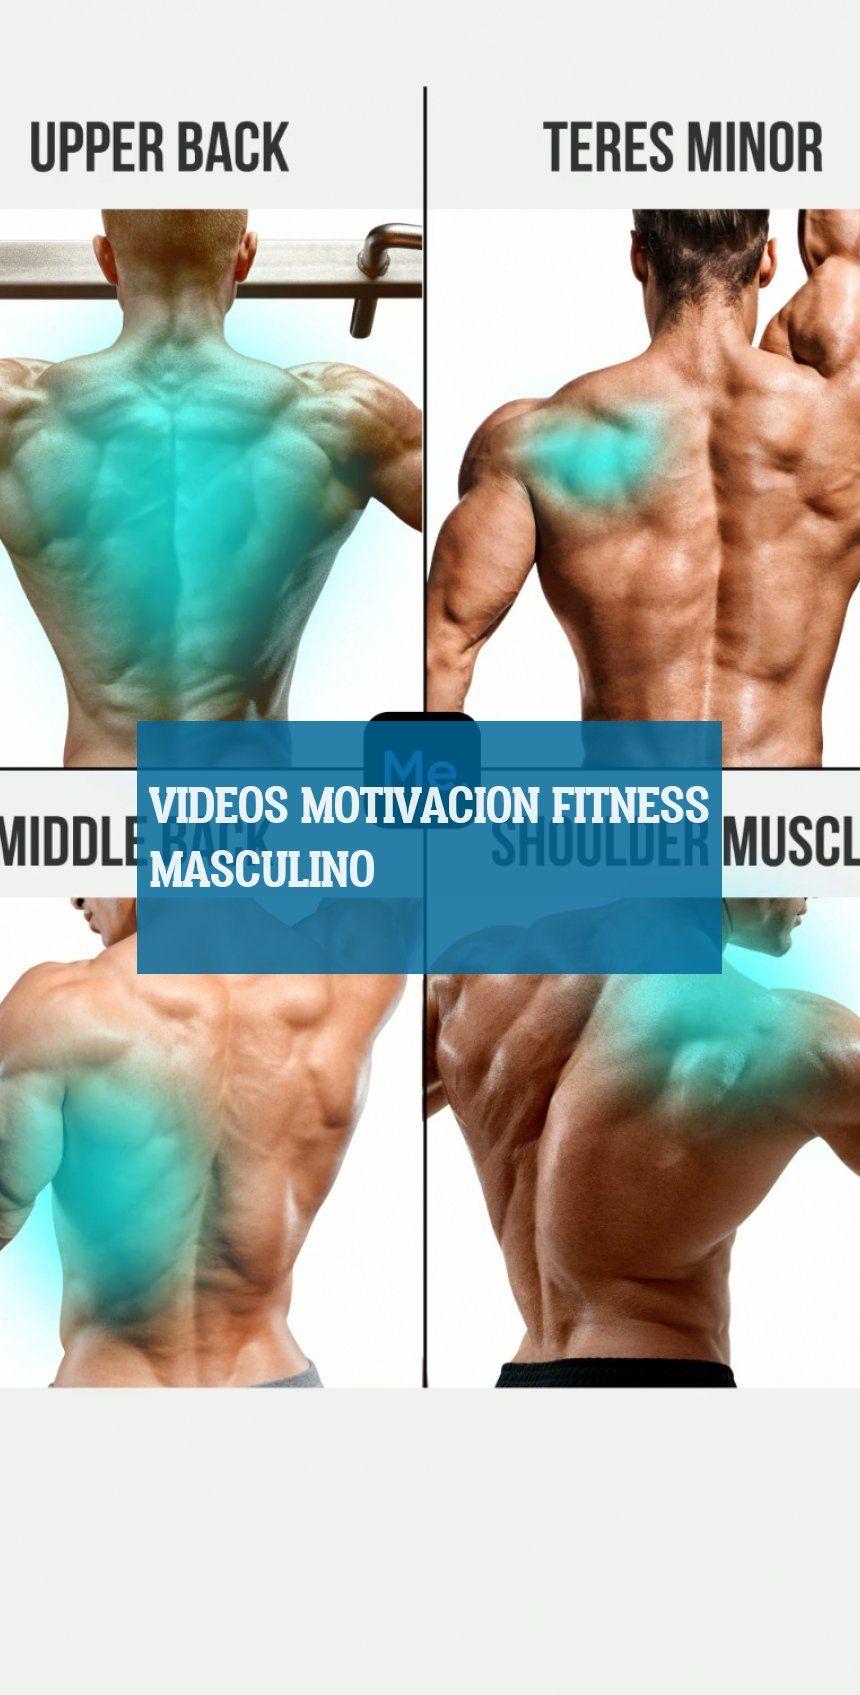 videos motivacion fitness masculino #videos #motivacion #fitness #masculino